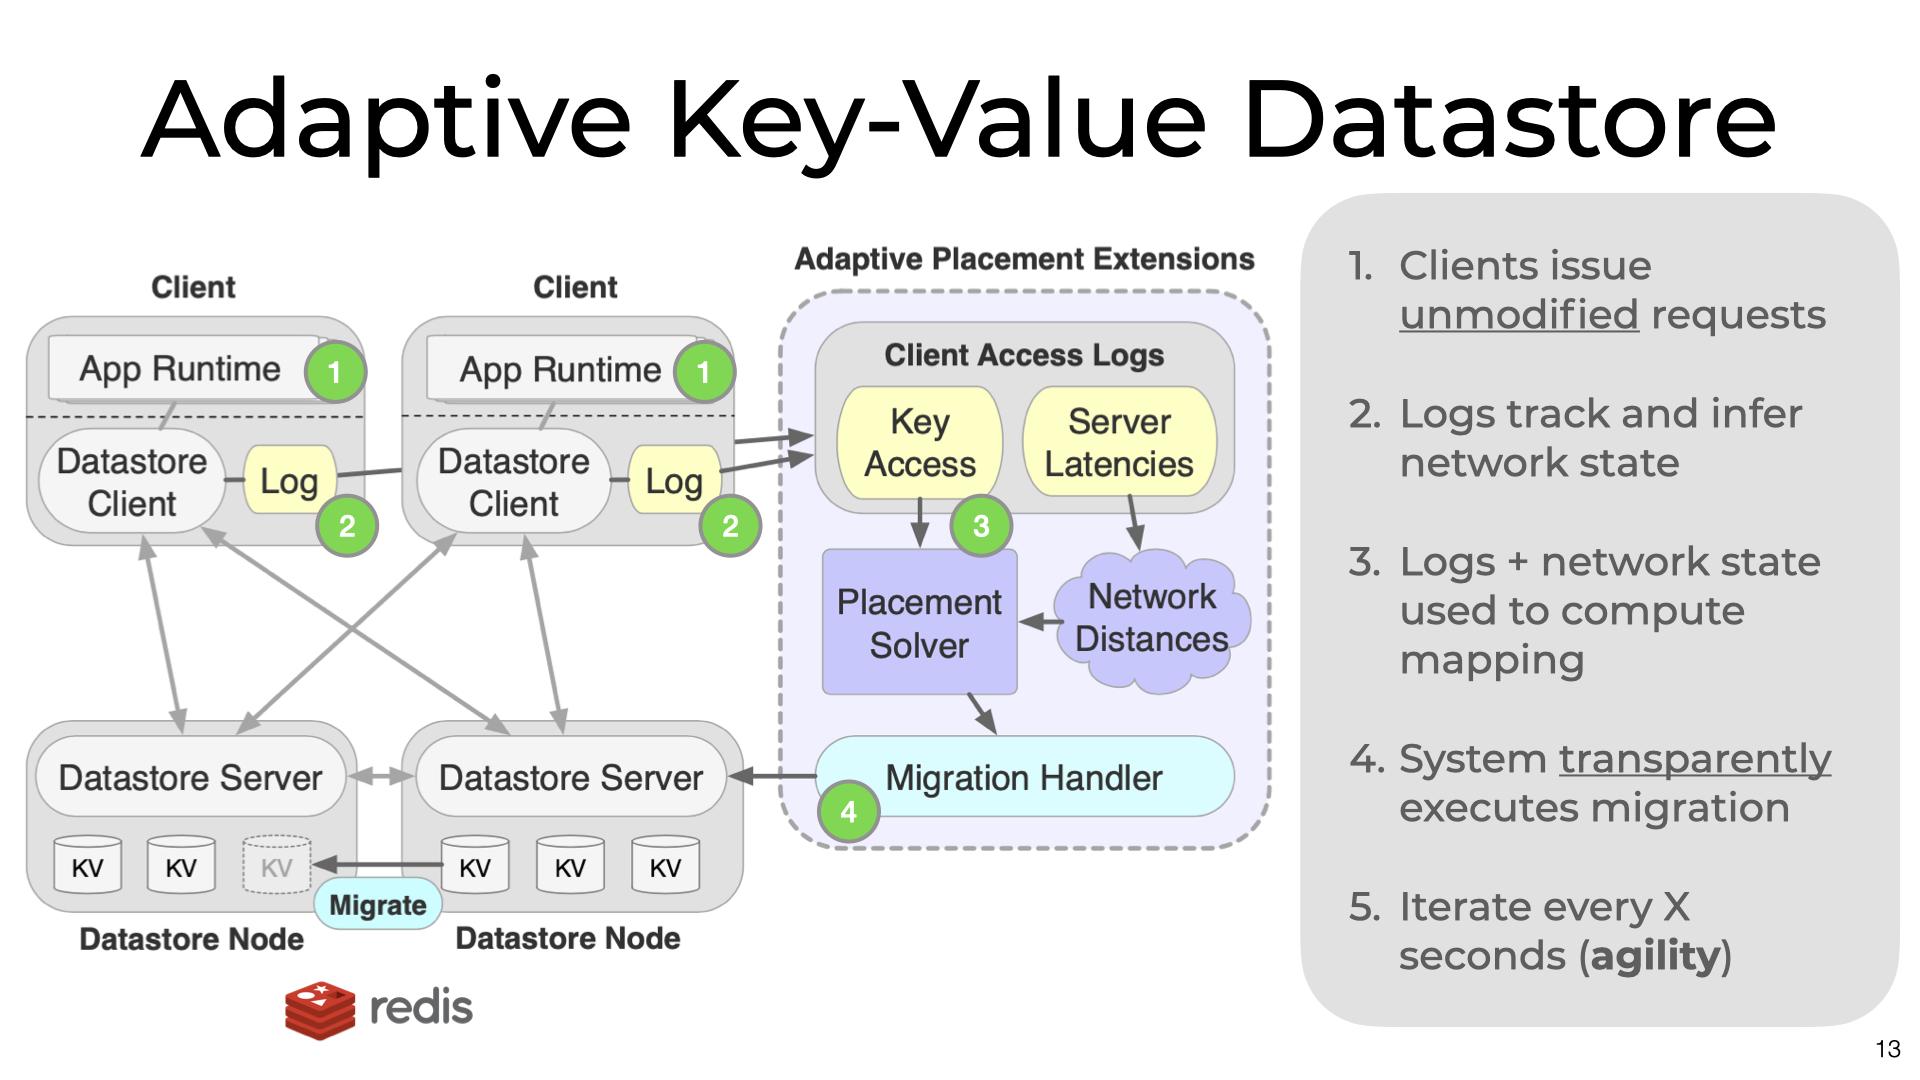 An Adaptive Datastore